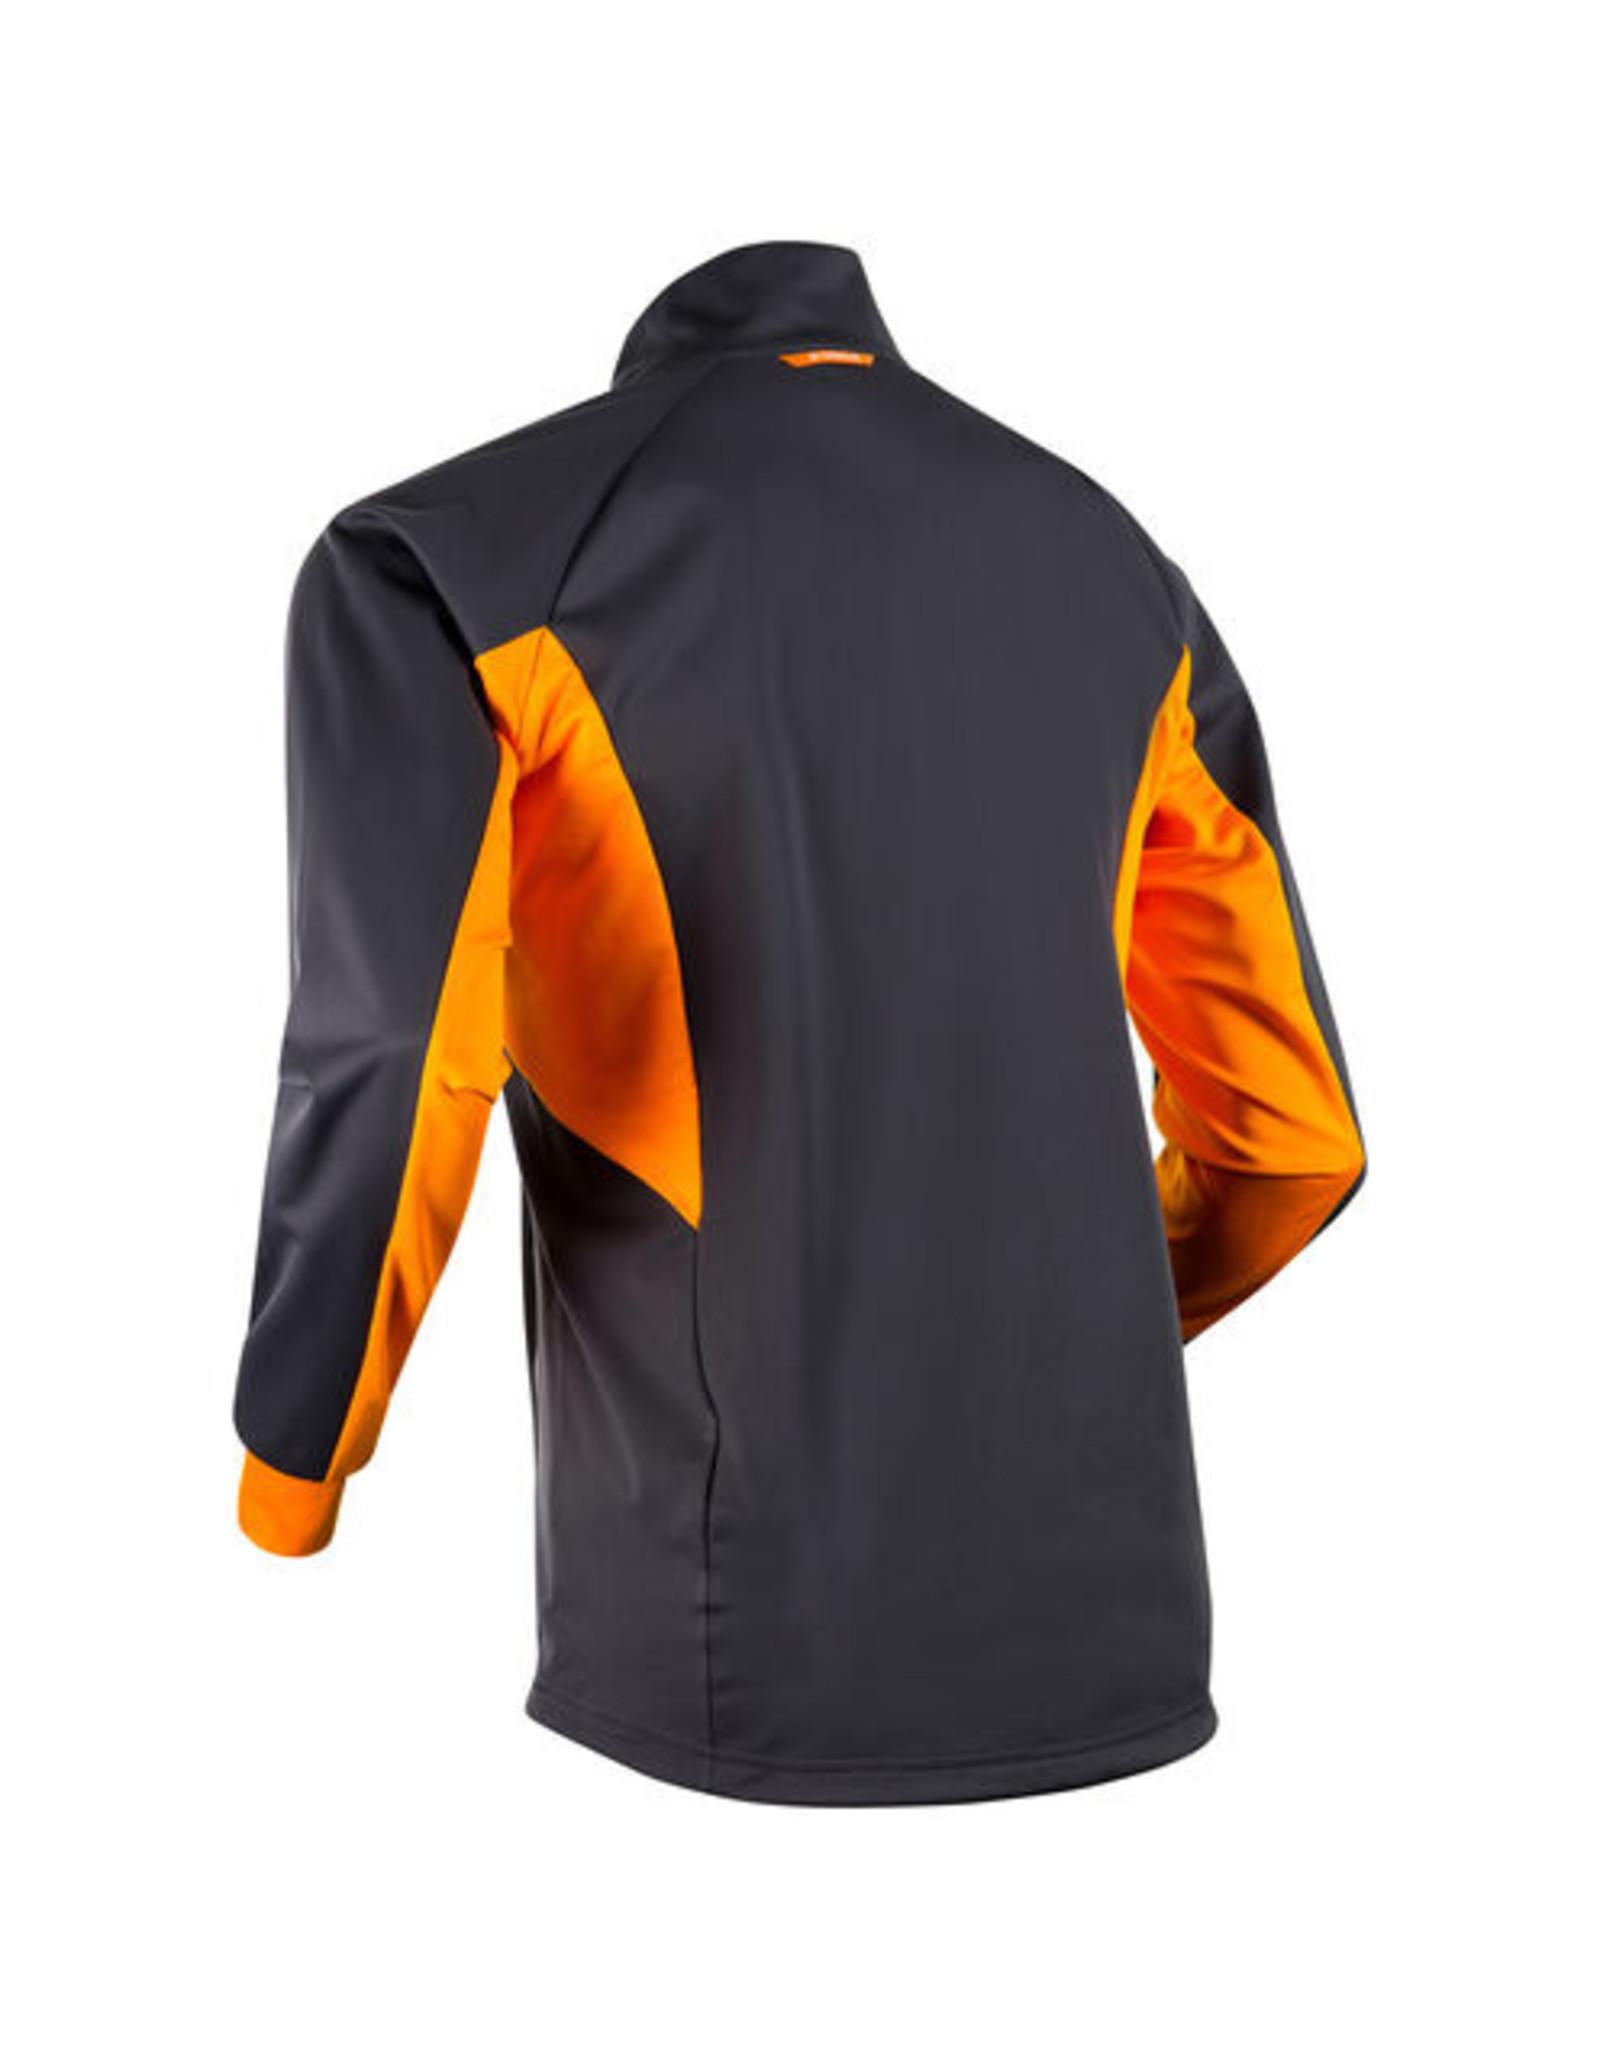 Bjorn Daehlie Men's Beito Jacket